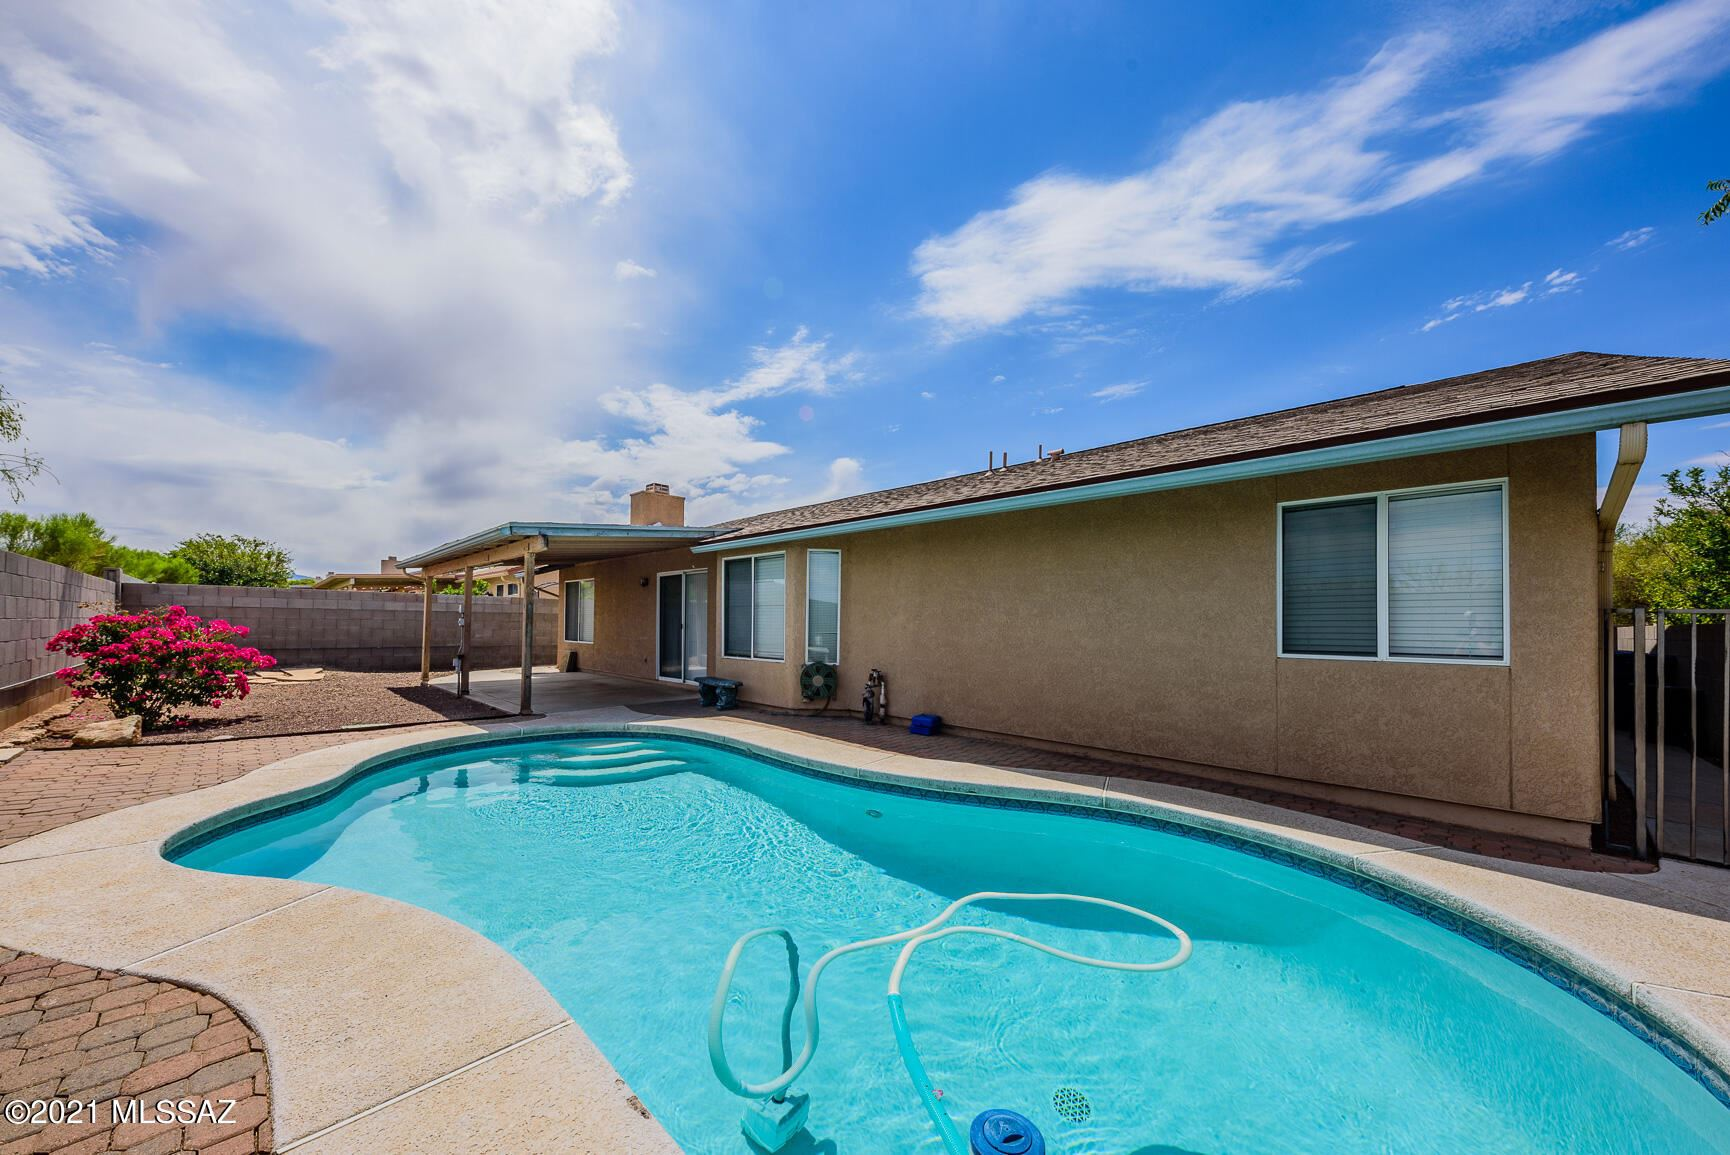 9811 E Bennett Drive, Tucson, AZ 85747 - MLS#: 22114503